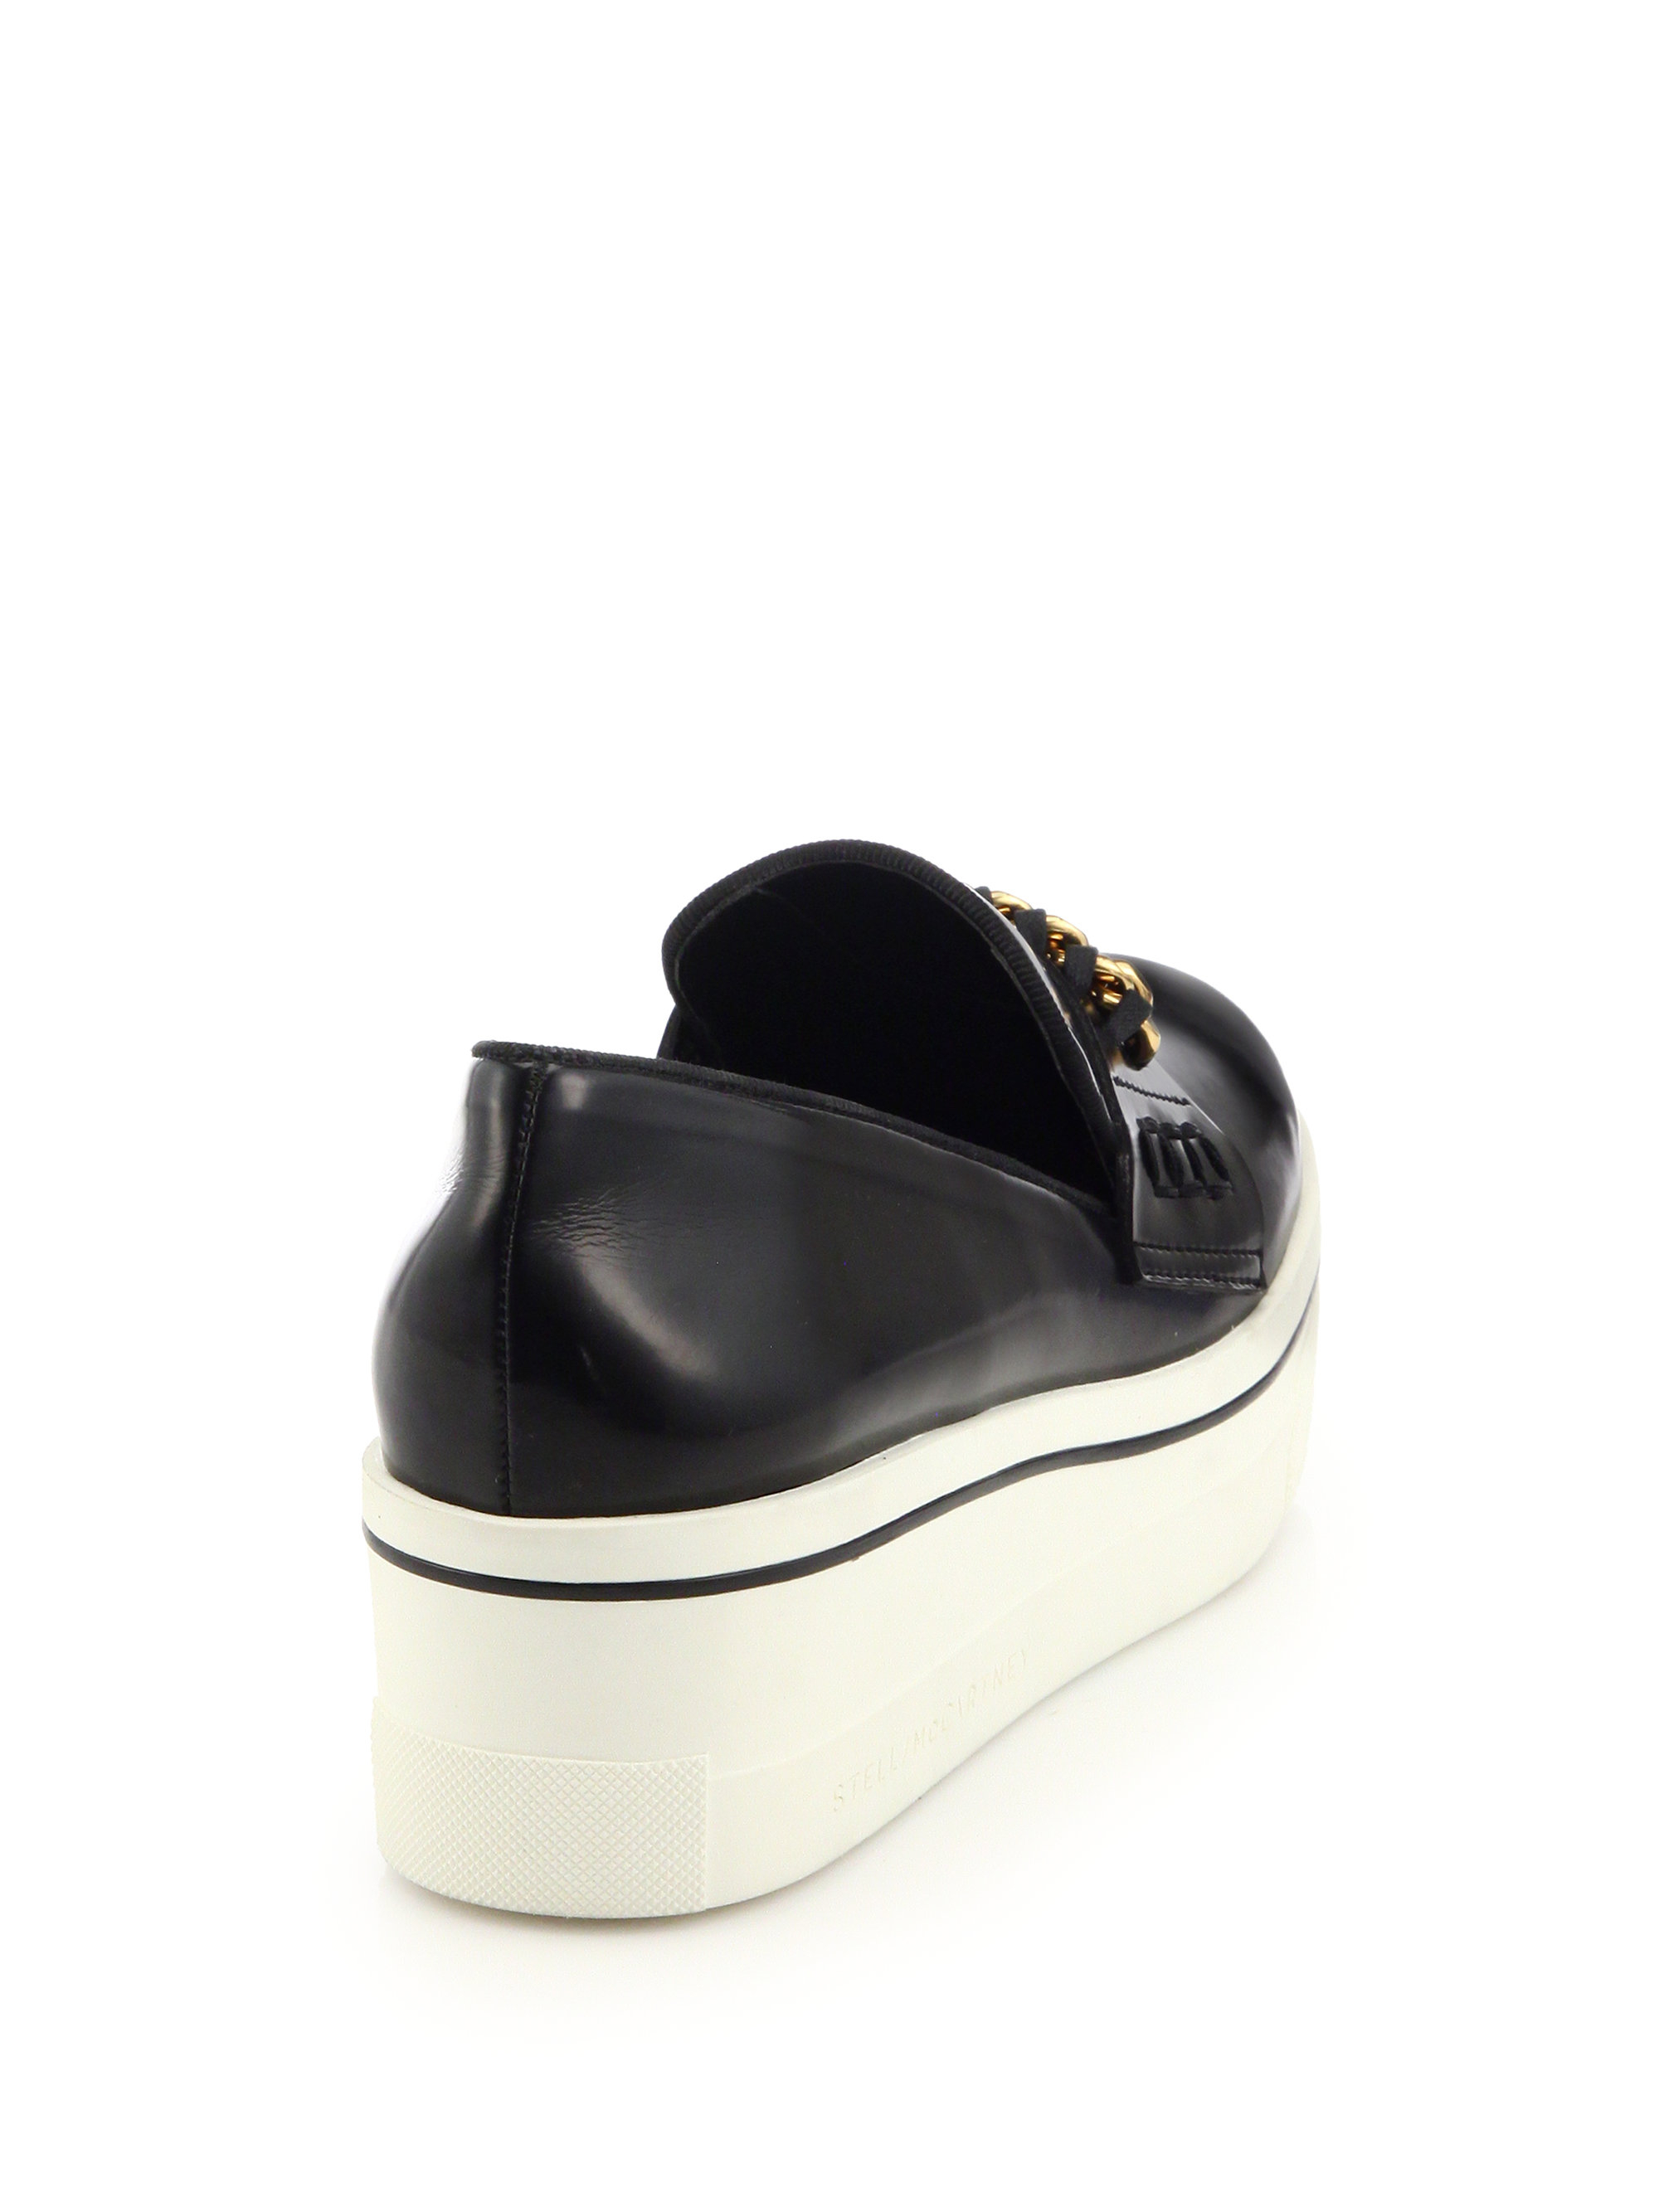 Stella Mccartney Chain Trimmed Rubber Platform Loafers In